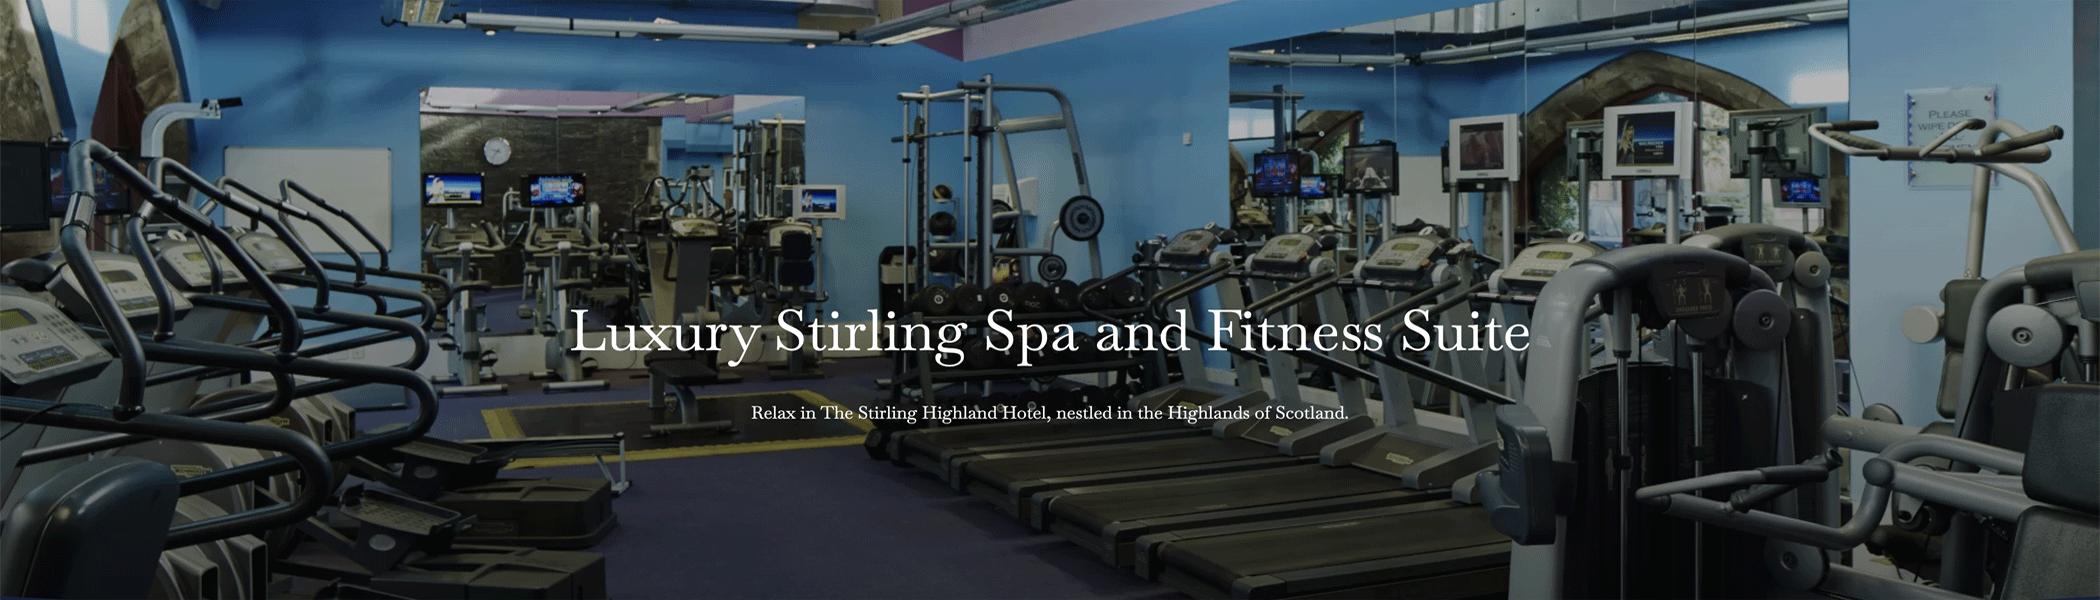 Stirling Highland Hotel gym